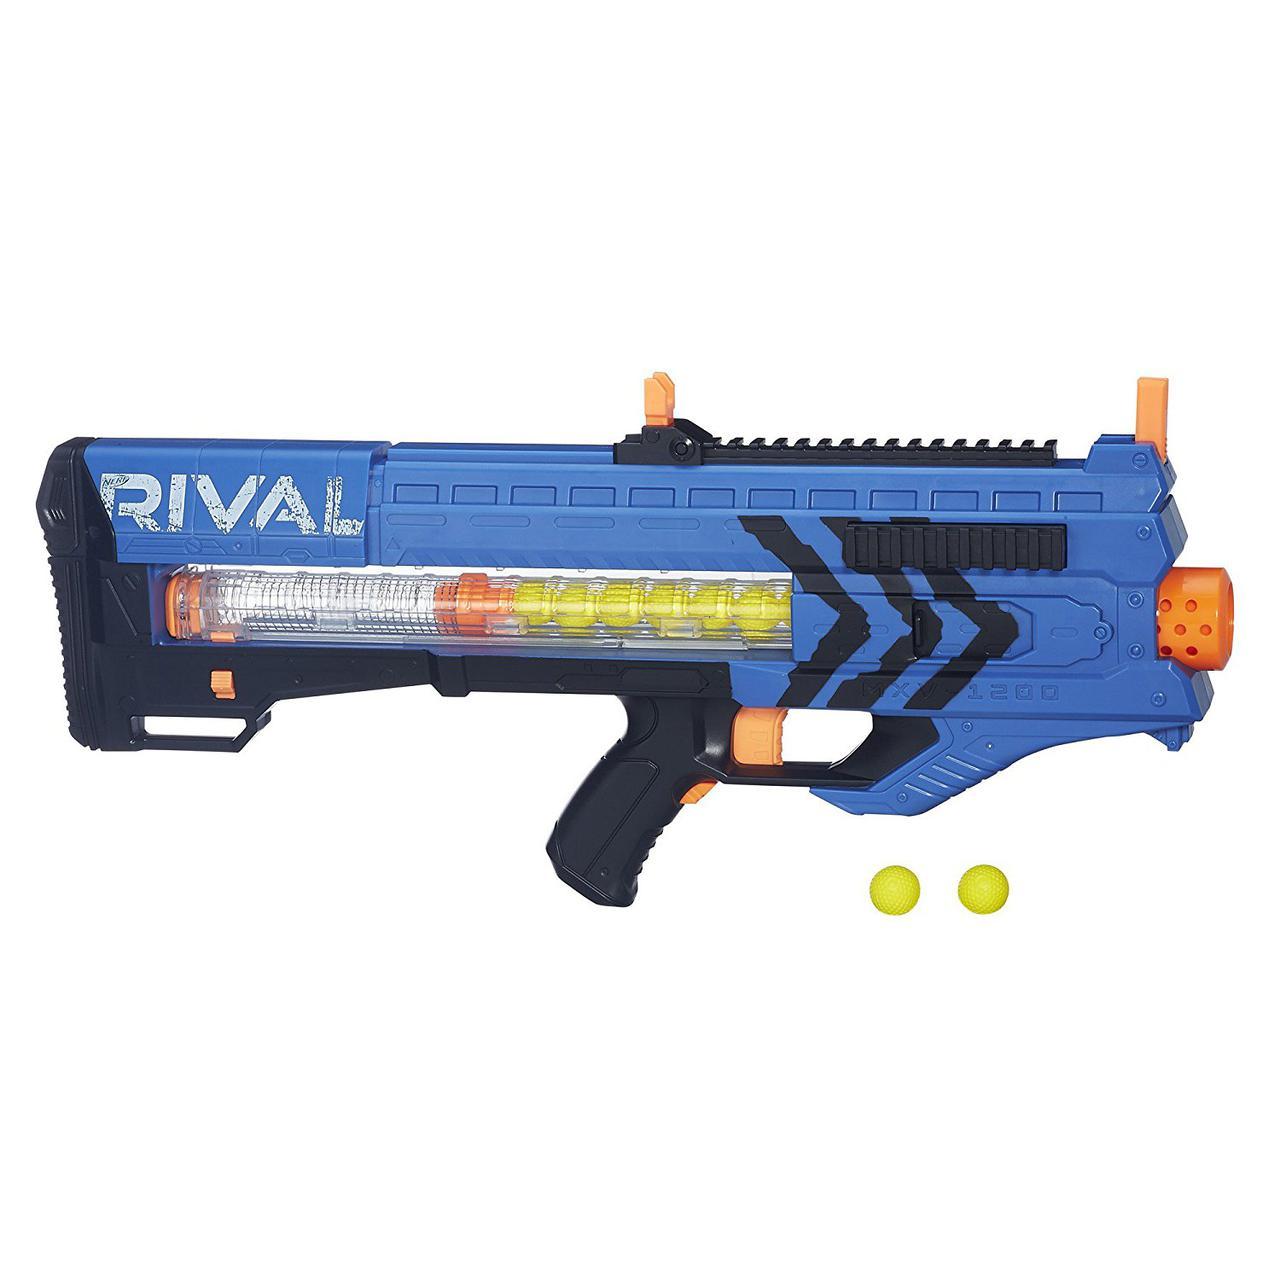 Nerf Бластер нерф райвал зенус синий Соперник Зевса Rival Zeus MXV-1200 Blaster Blue